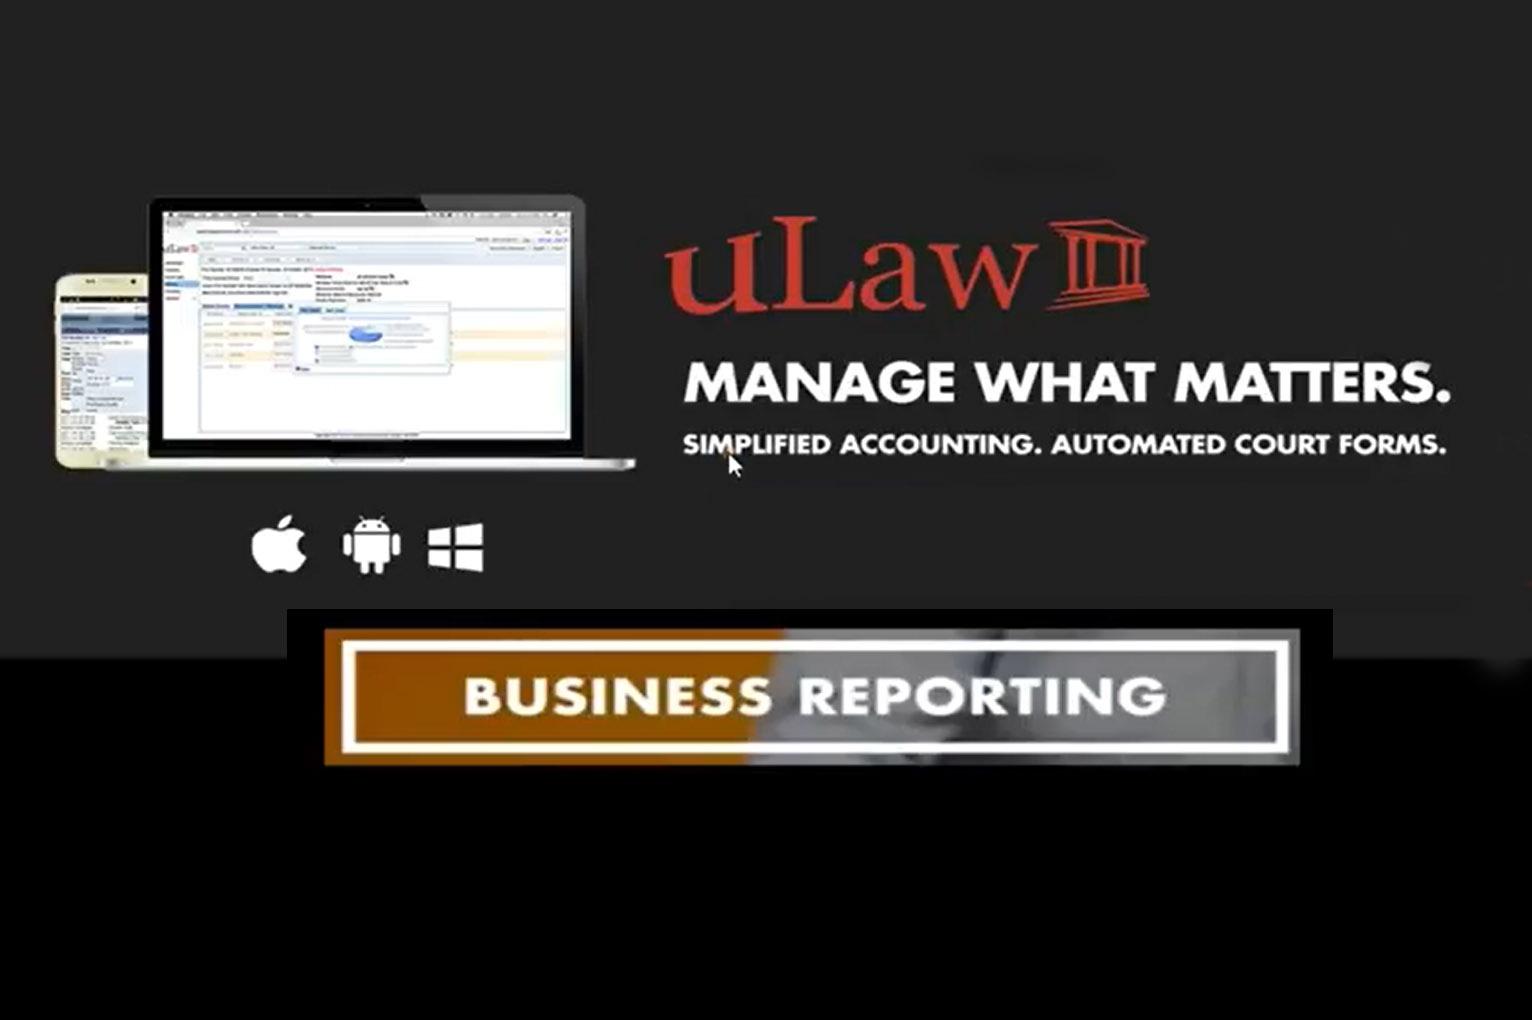 businessreporting-webinar